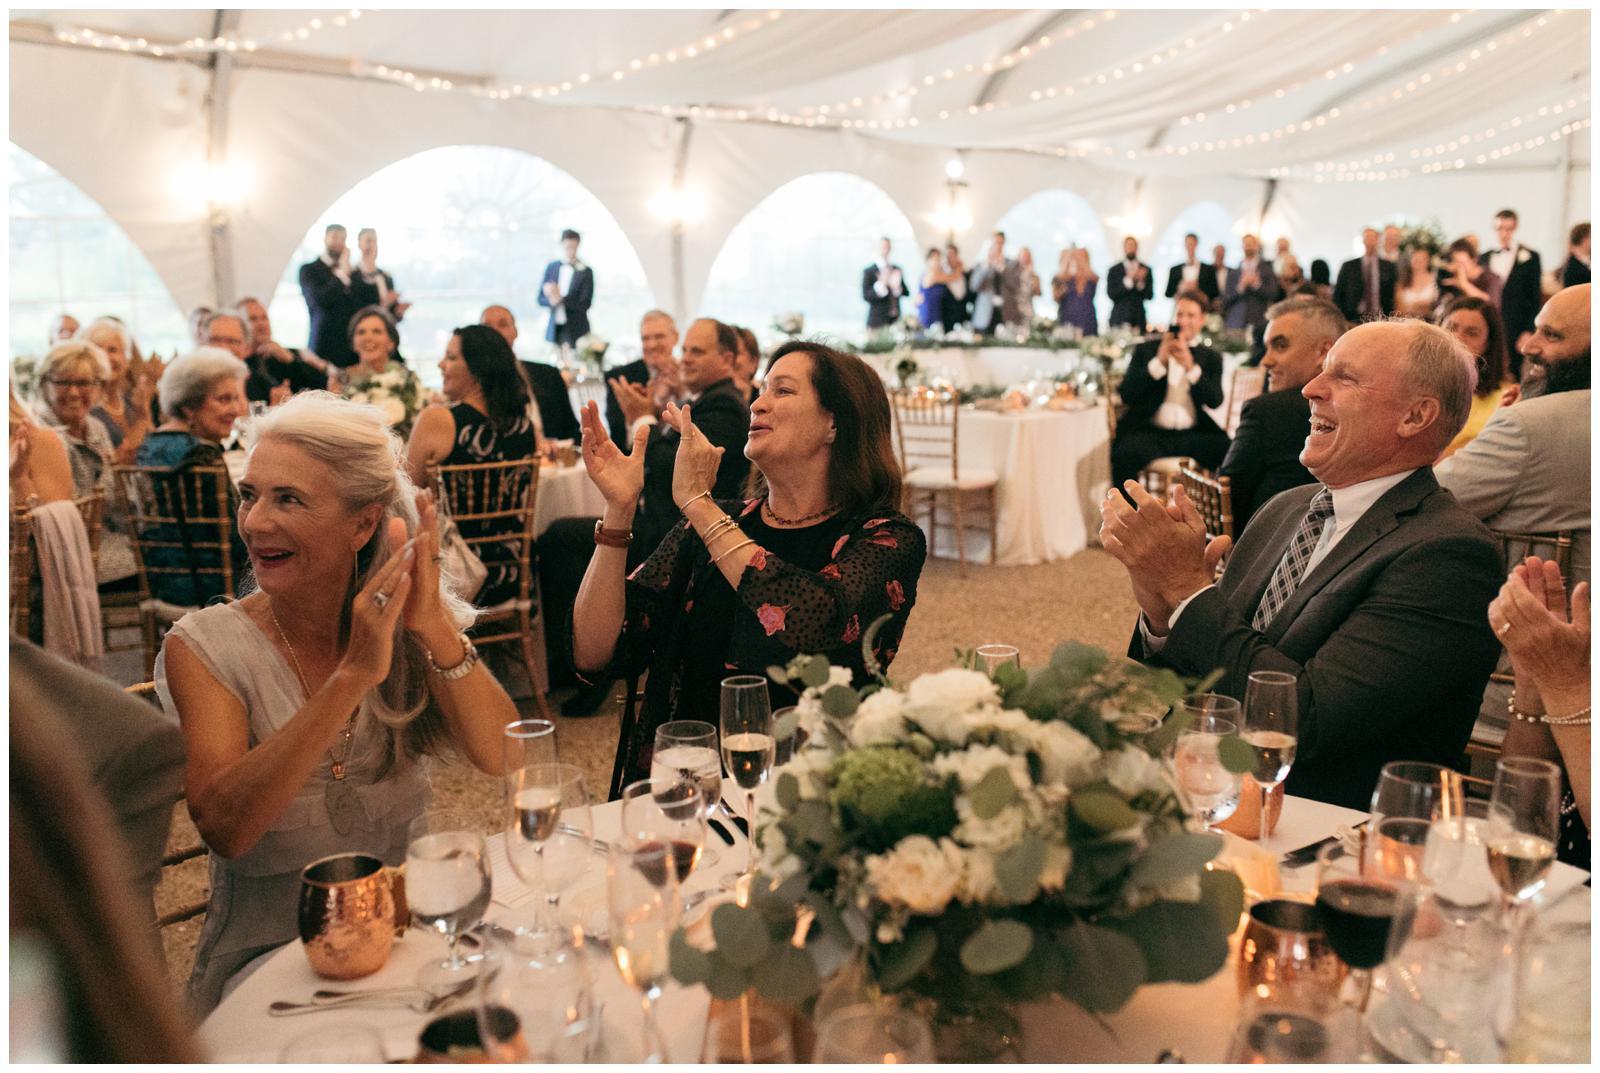 Misselwood wedding reception